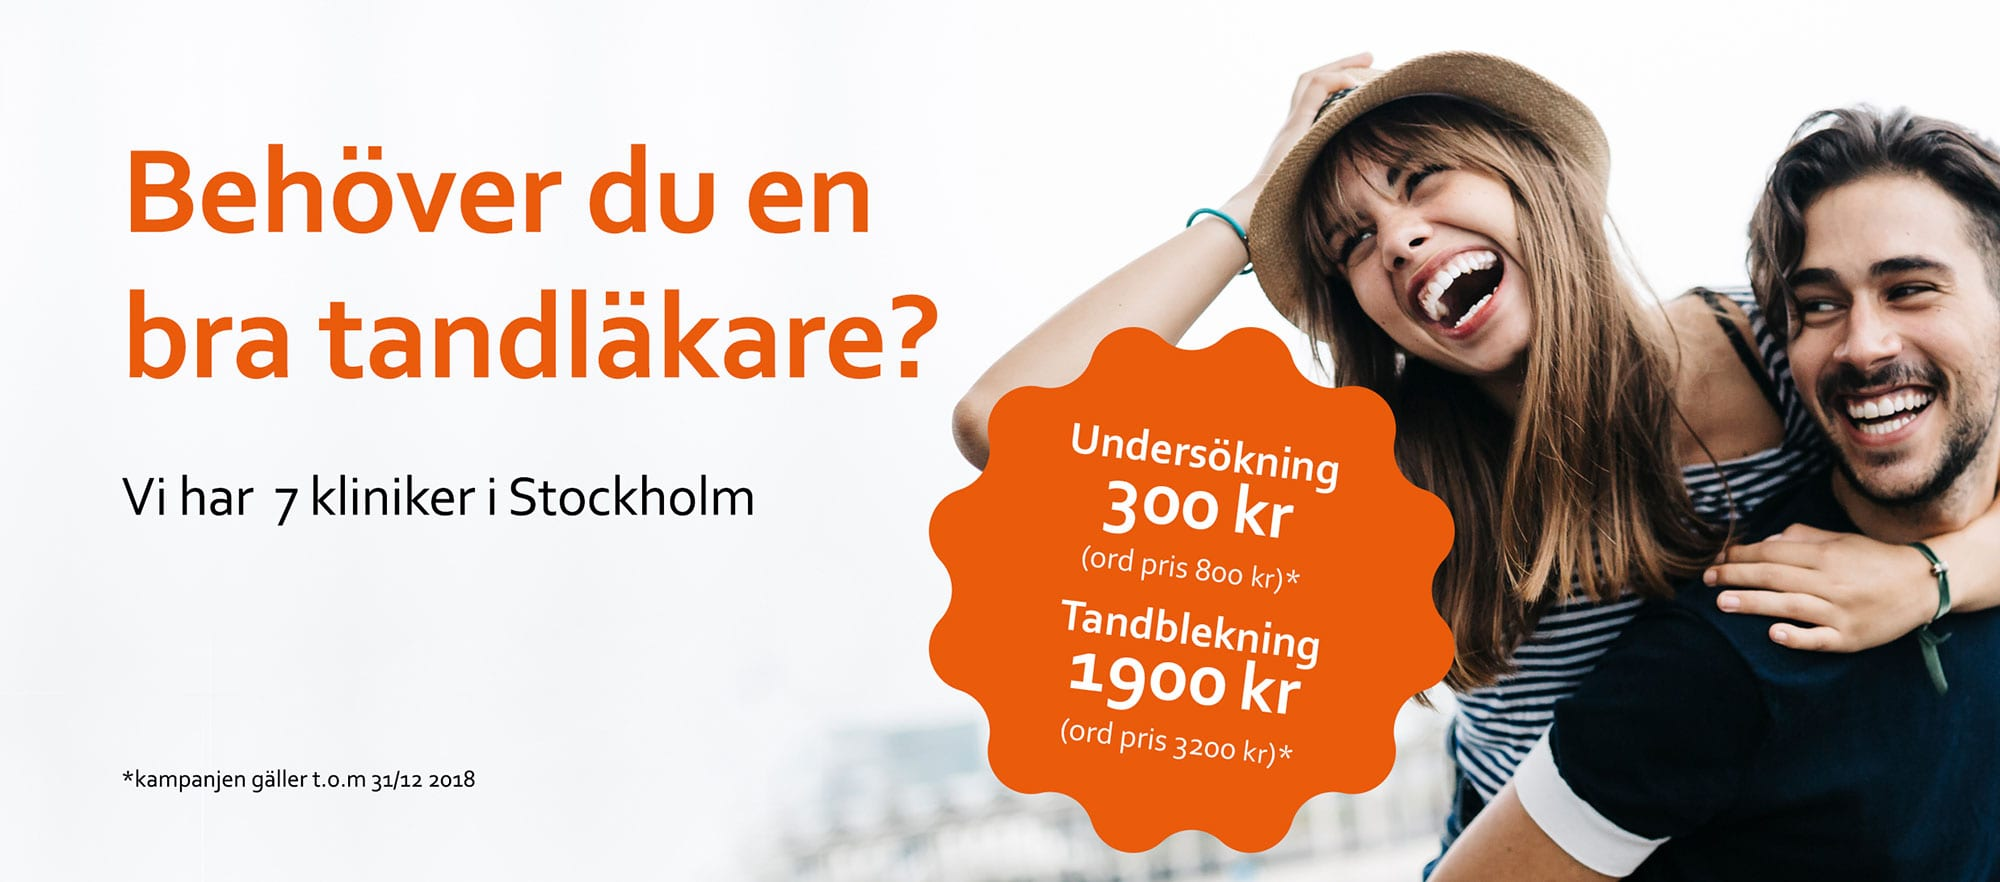 Tunnelbana kampanj